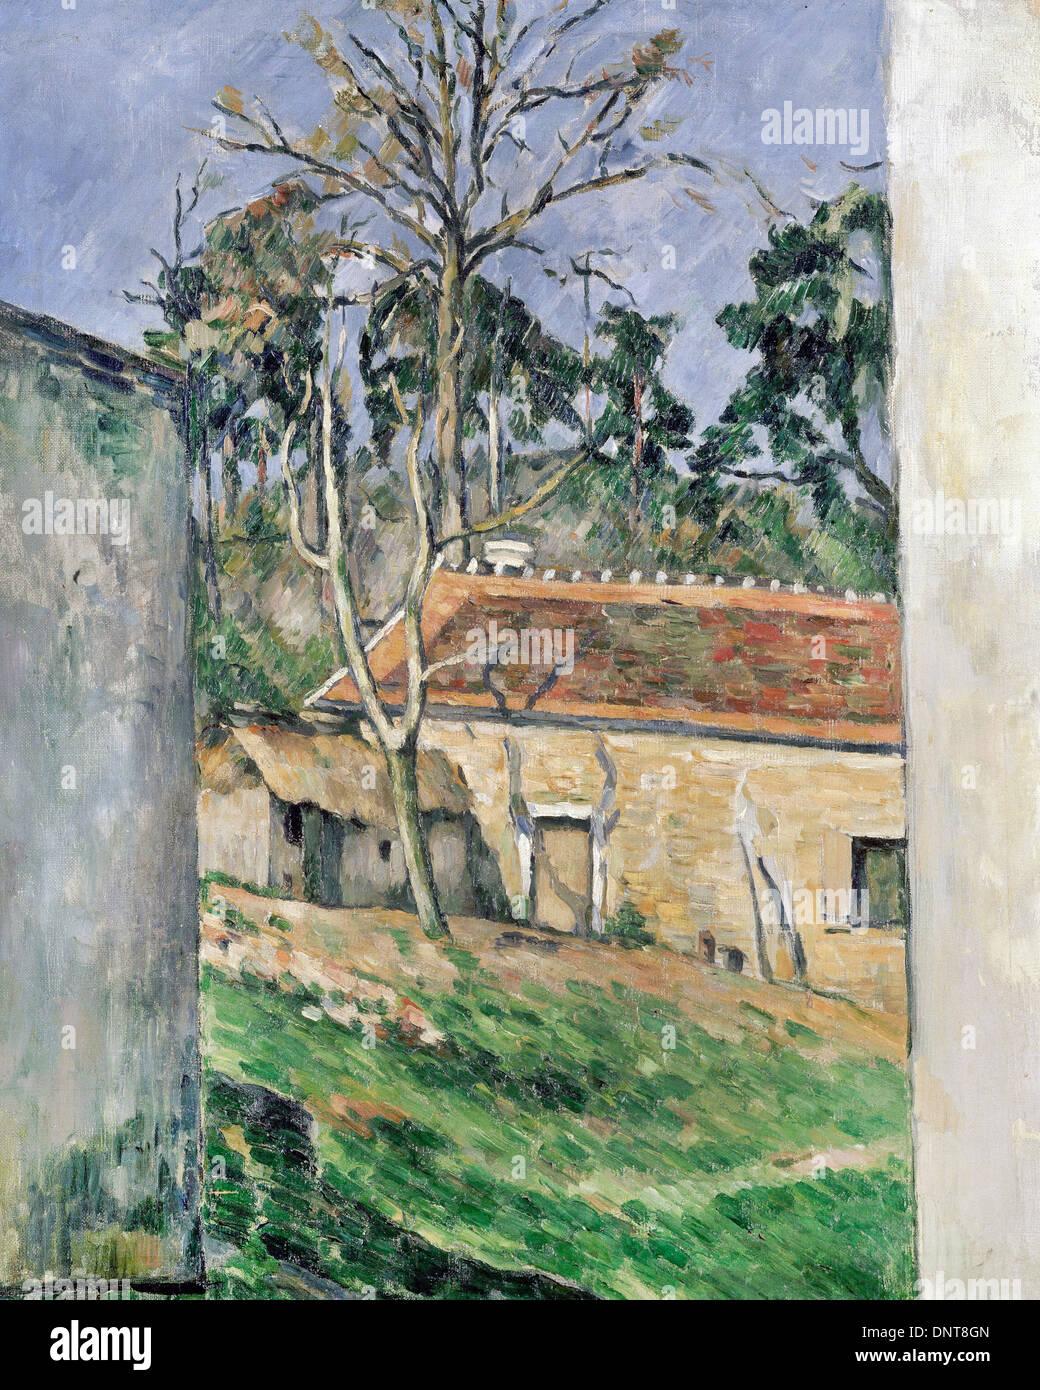 Paul Cezanne, Farmyard 1879 Oil on canvas. Musée d'Orsay, Paris, France. - Stock Image